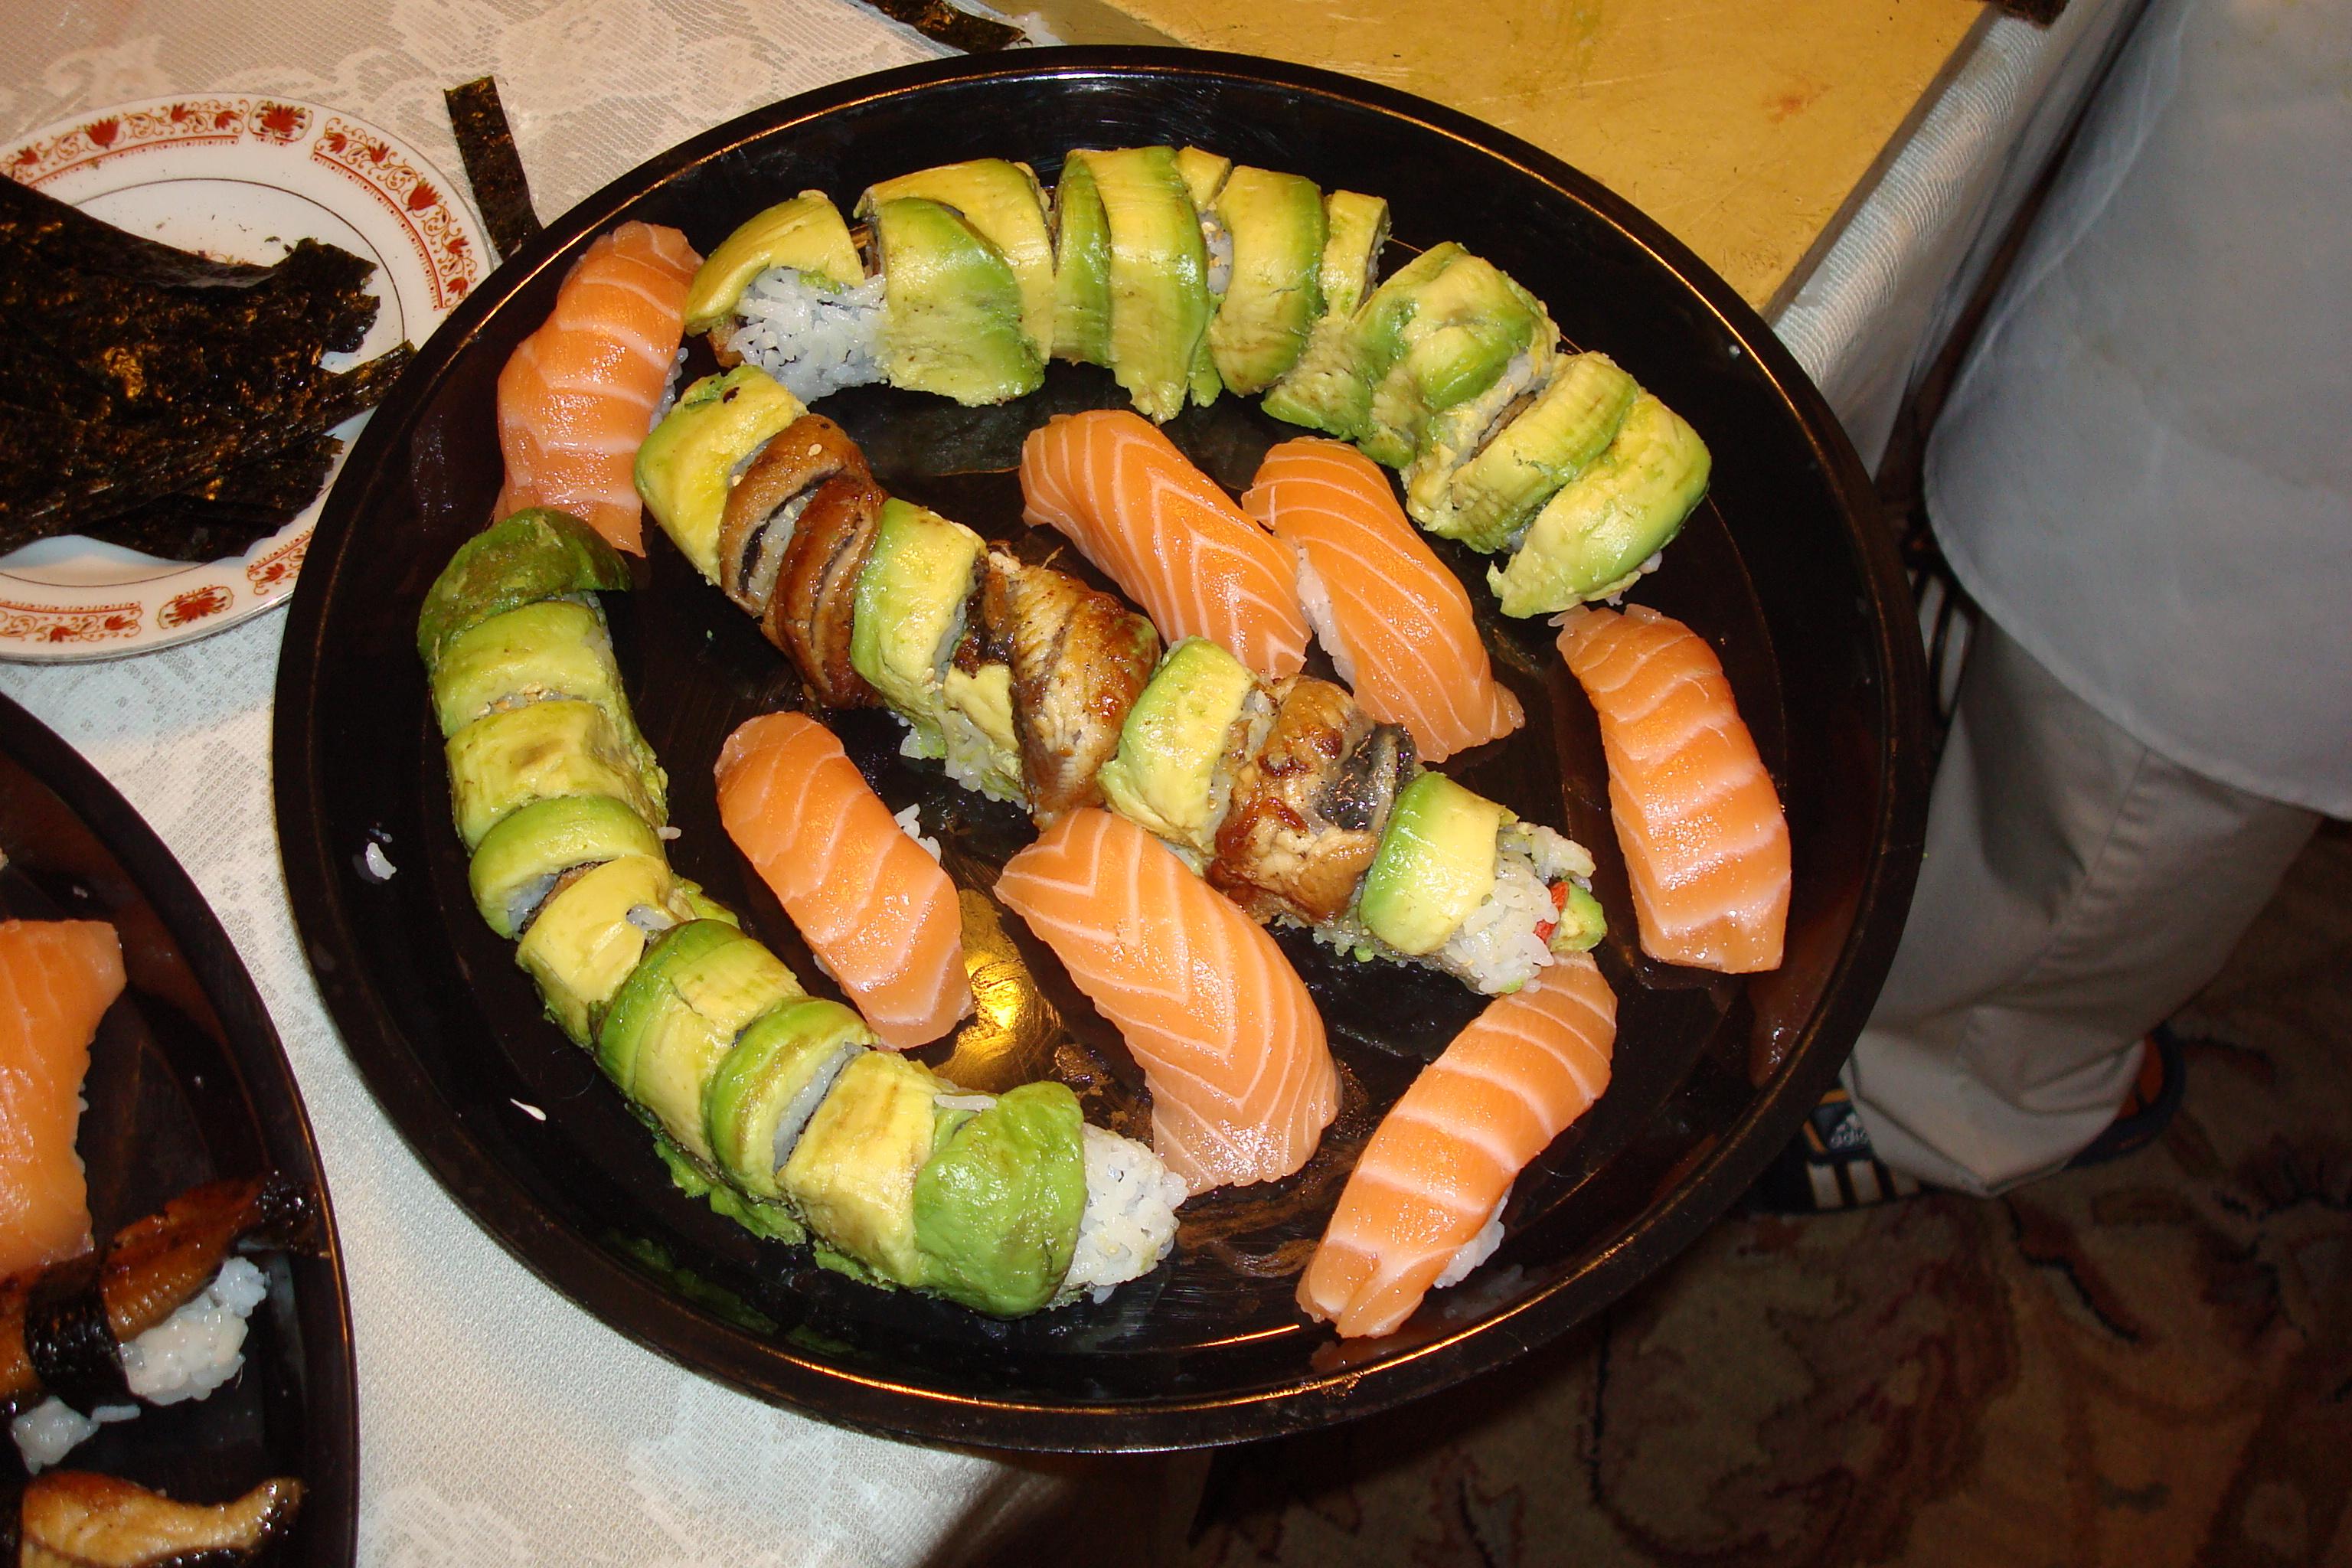 Custom Avocado, Salmon, Eel Rolls